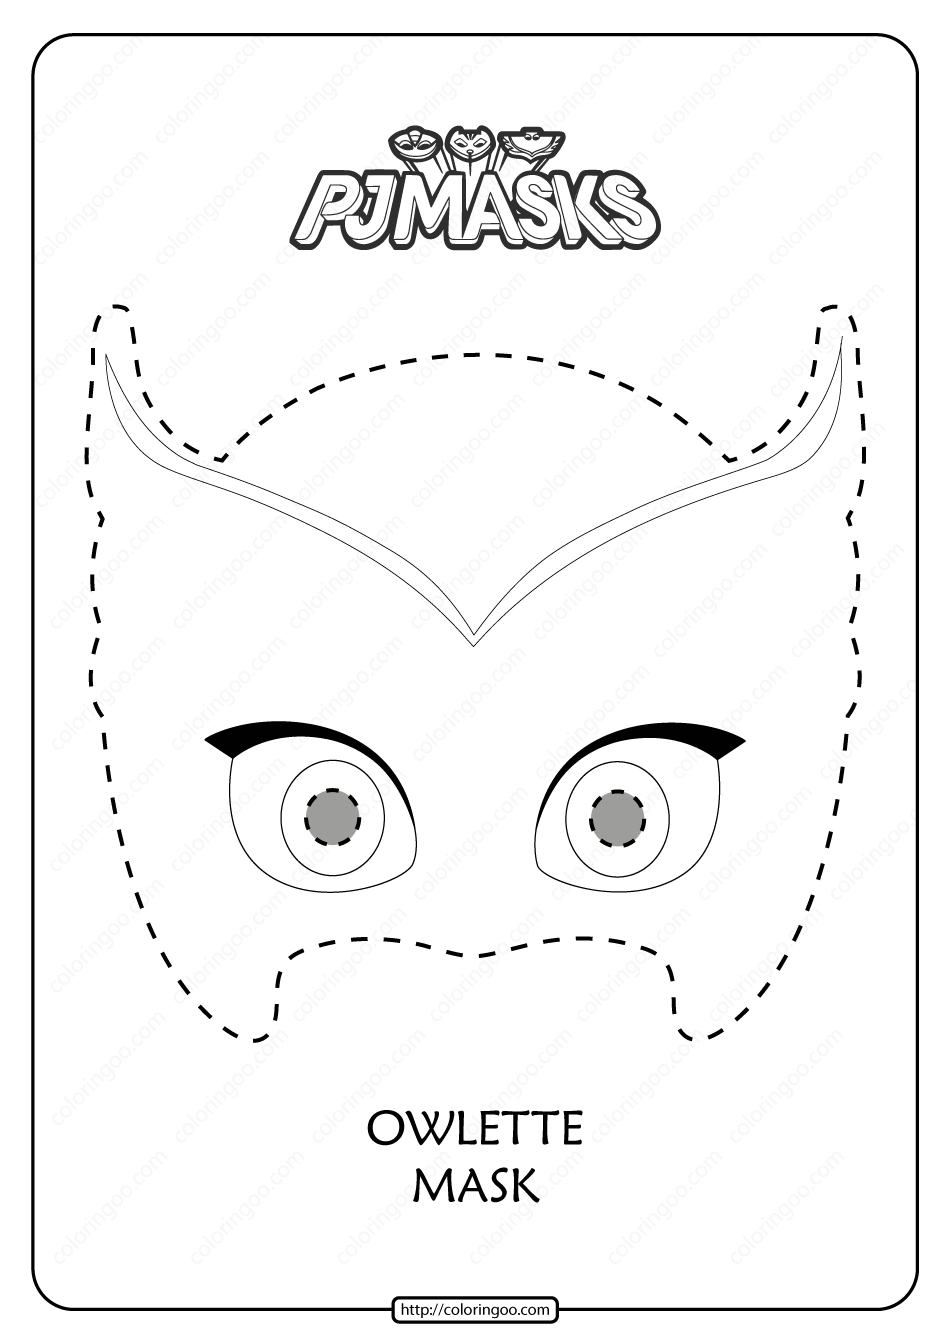 Free Printable Owlette PJ Masks Coloring Page